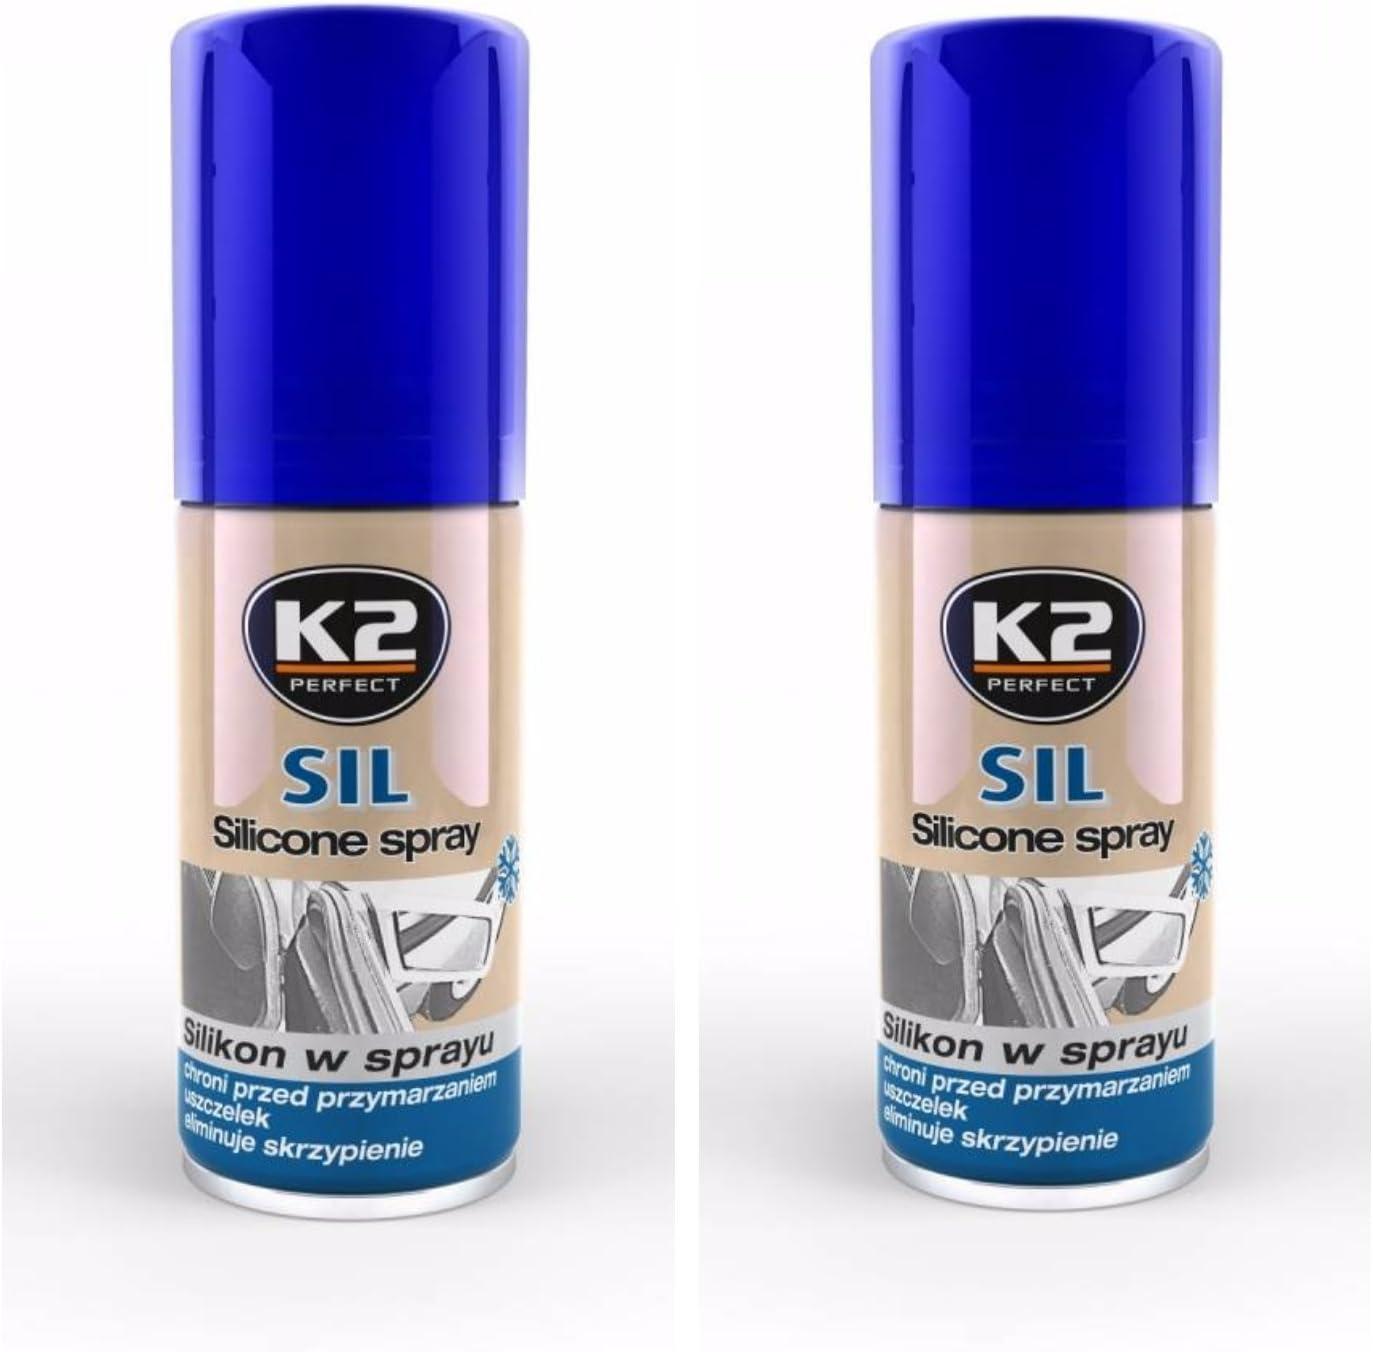 K2 Silicona Aerosol, Silicon Spray, Aceite - Lubricante, Spray 300 ...